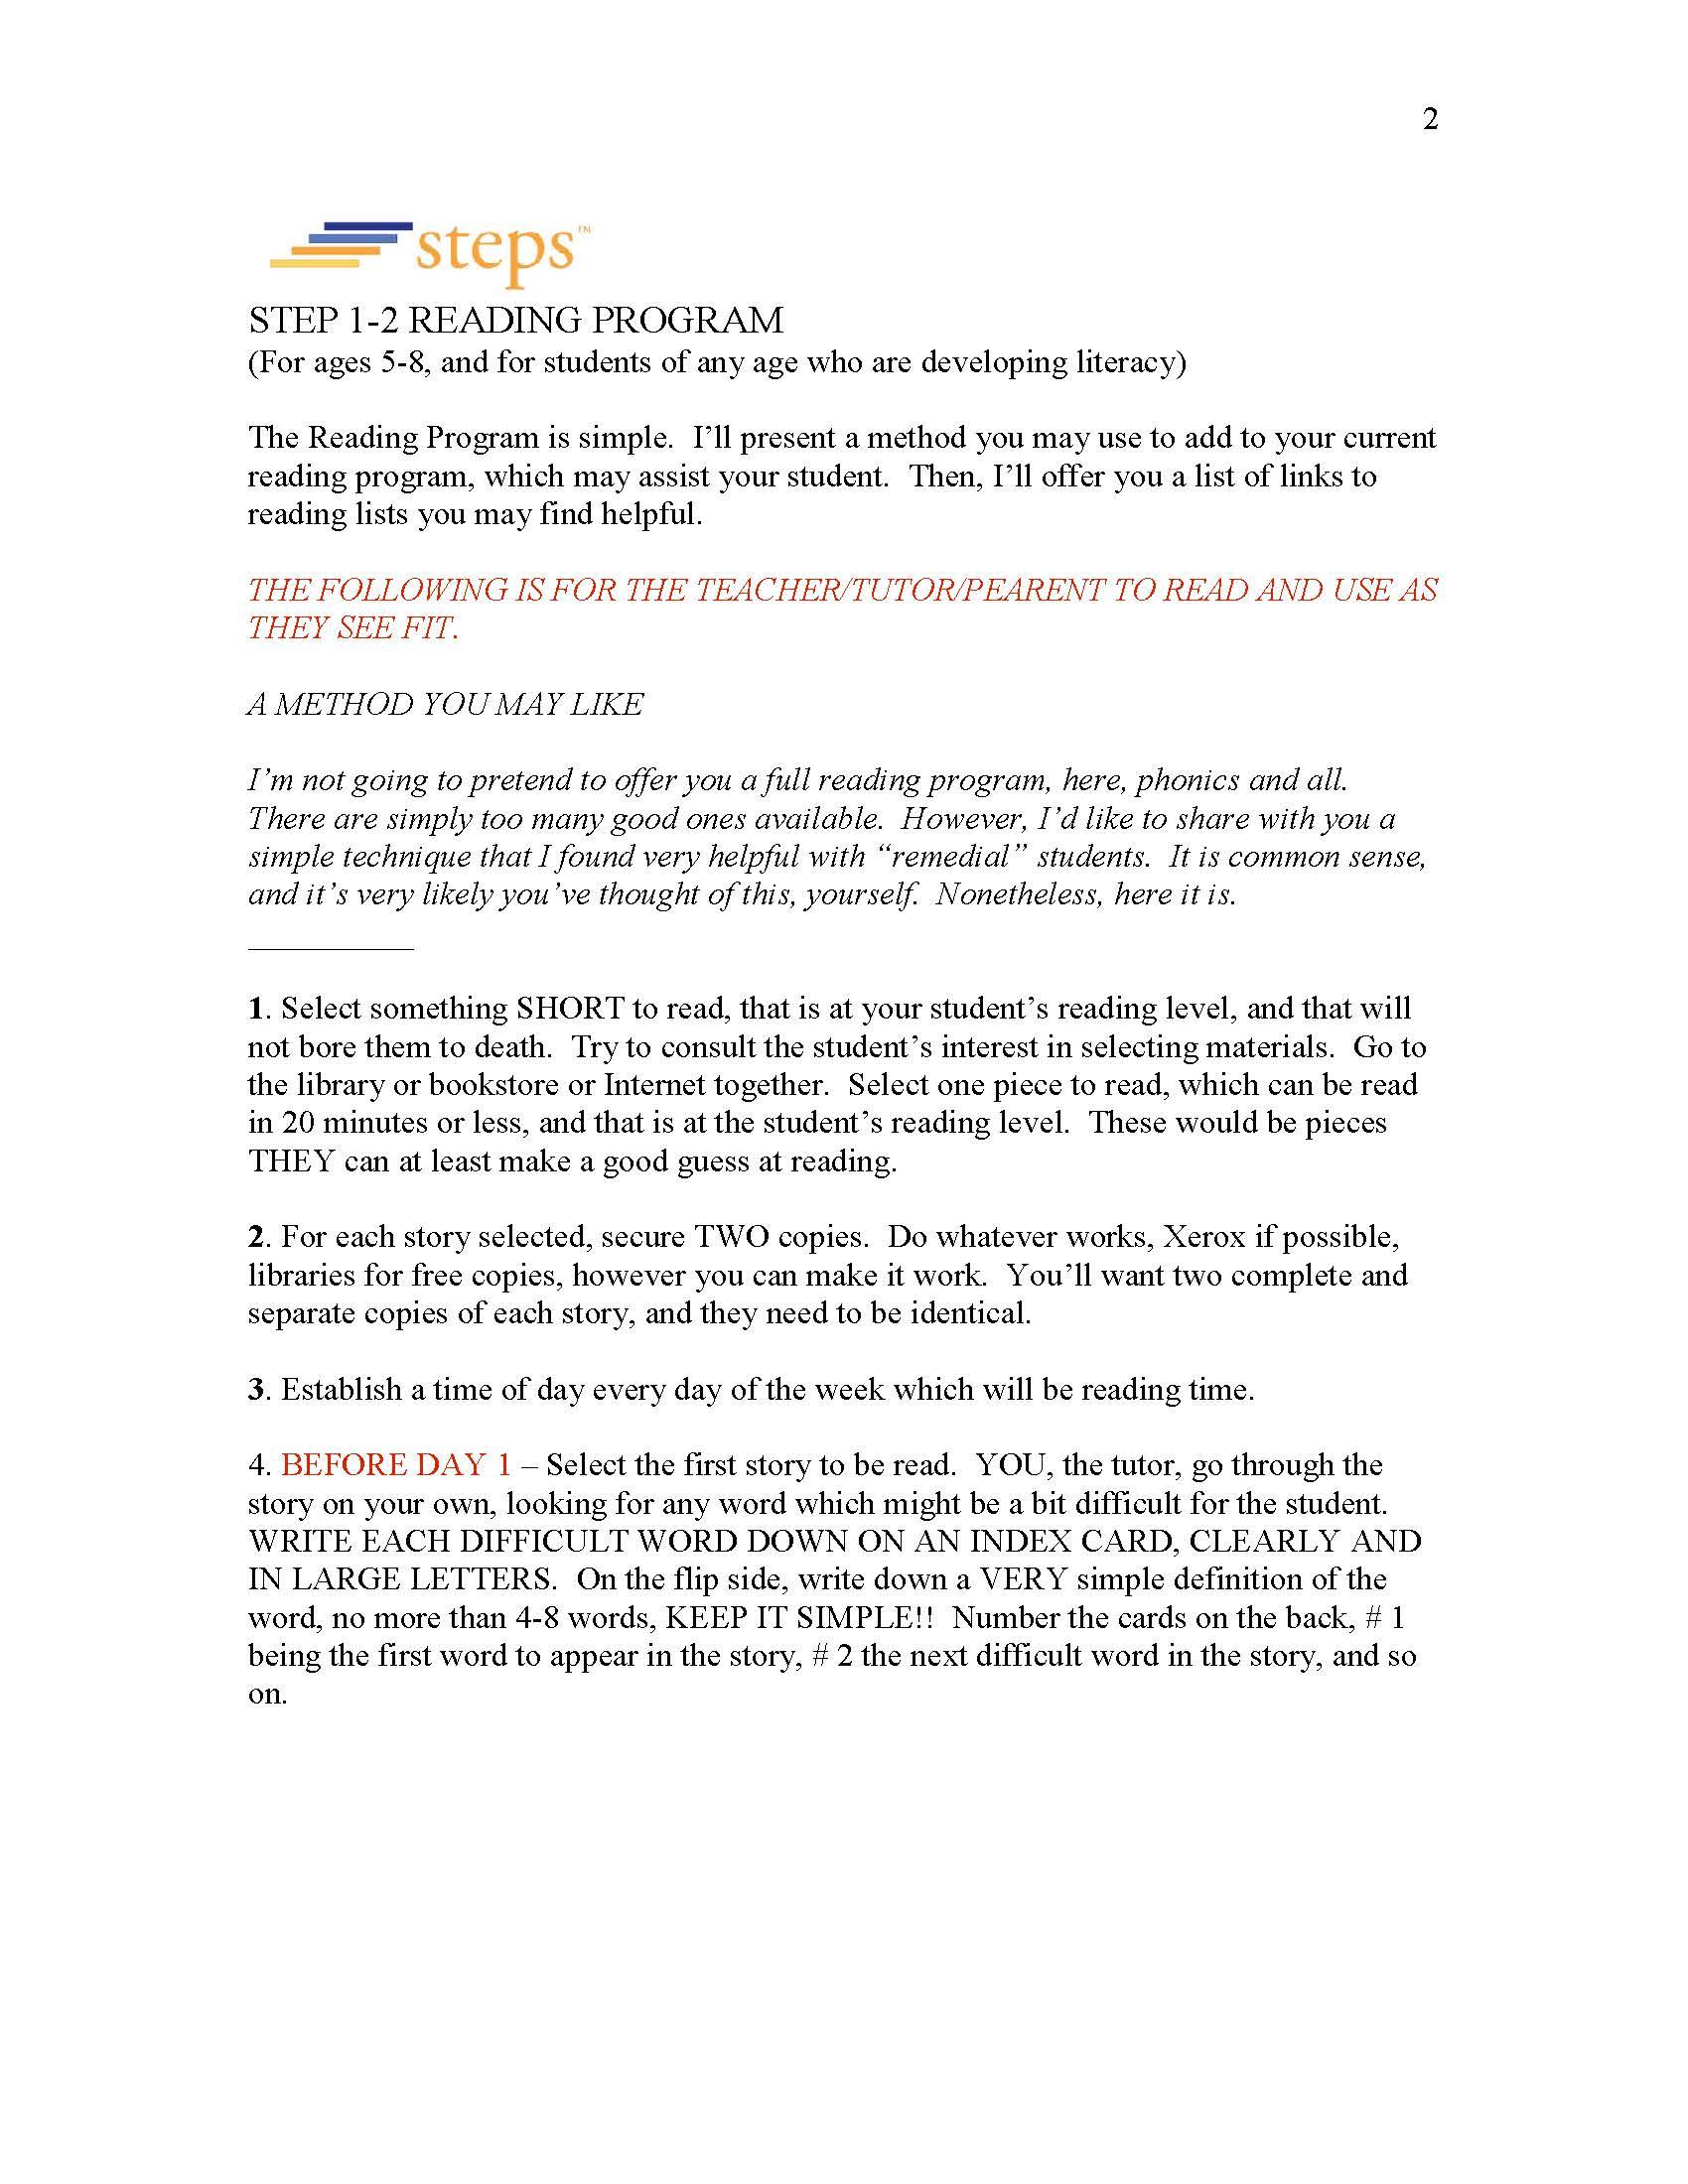 STEP 1-2 Reading Program_Page_3.jpg